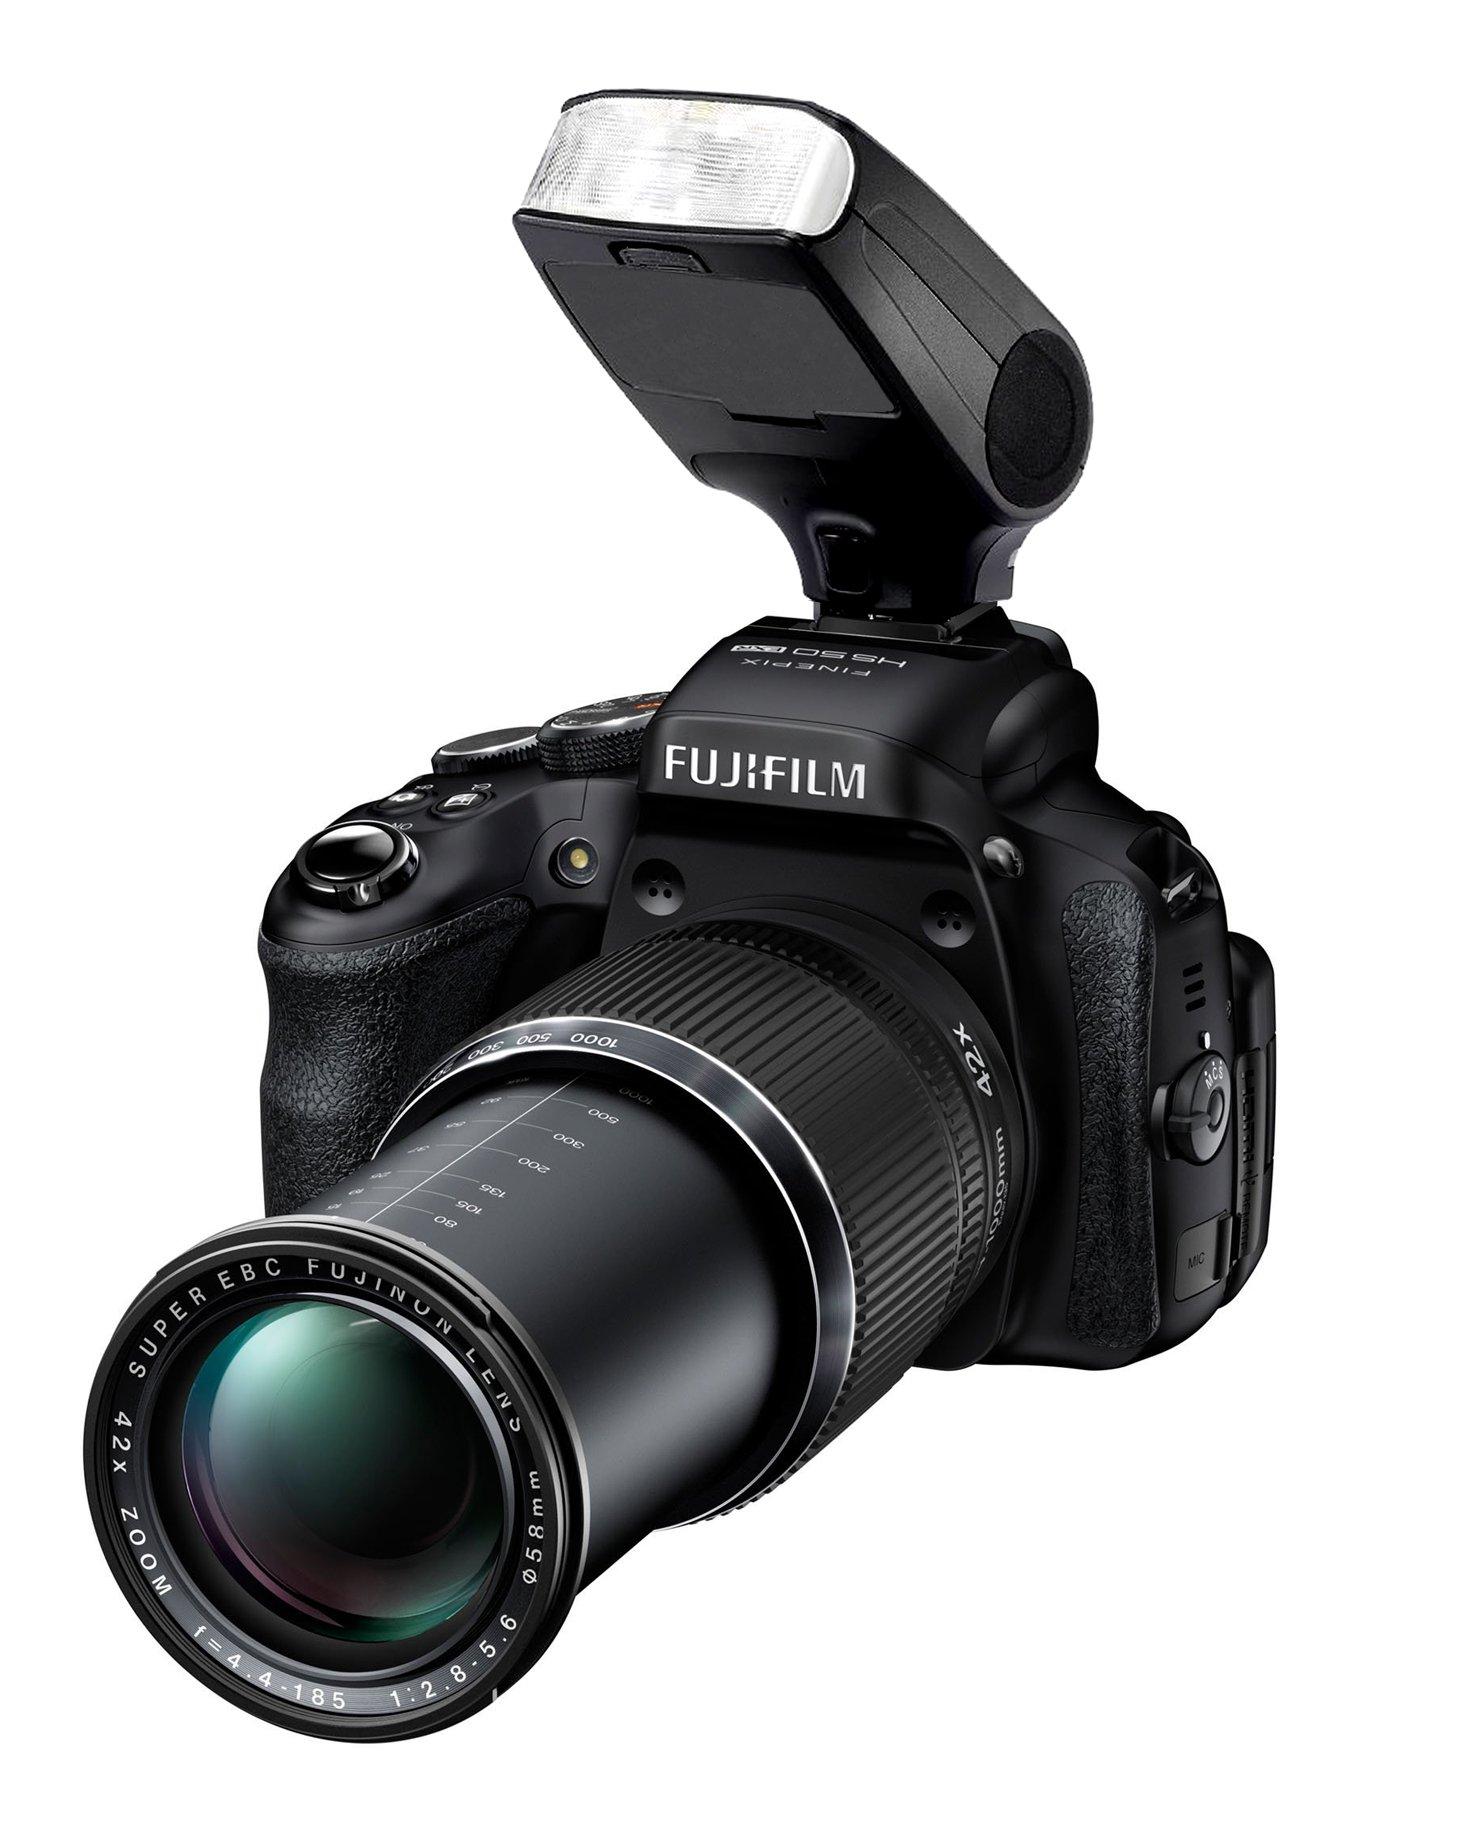 Fujifilm FinePix HS50EXR Bounce, Swivel Head Compact Flash (TTL) + Nw Direct Micro Fiber Cleaning Cloth by Vivitar/Digital (Image #1)